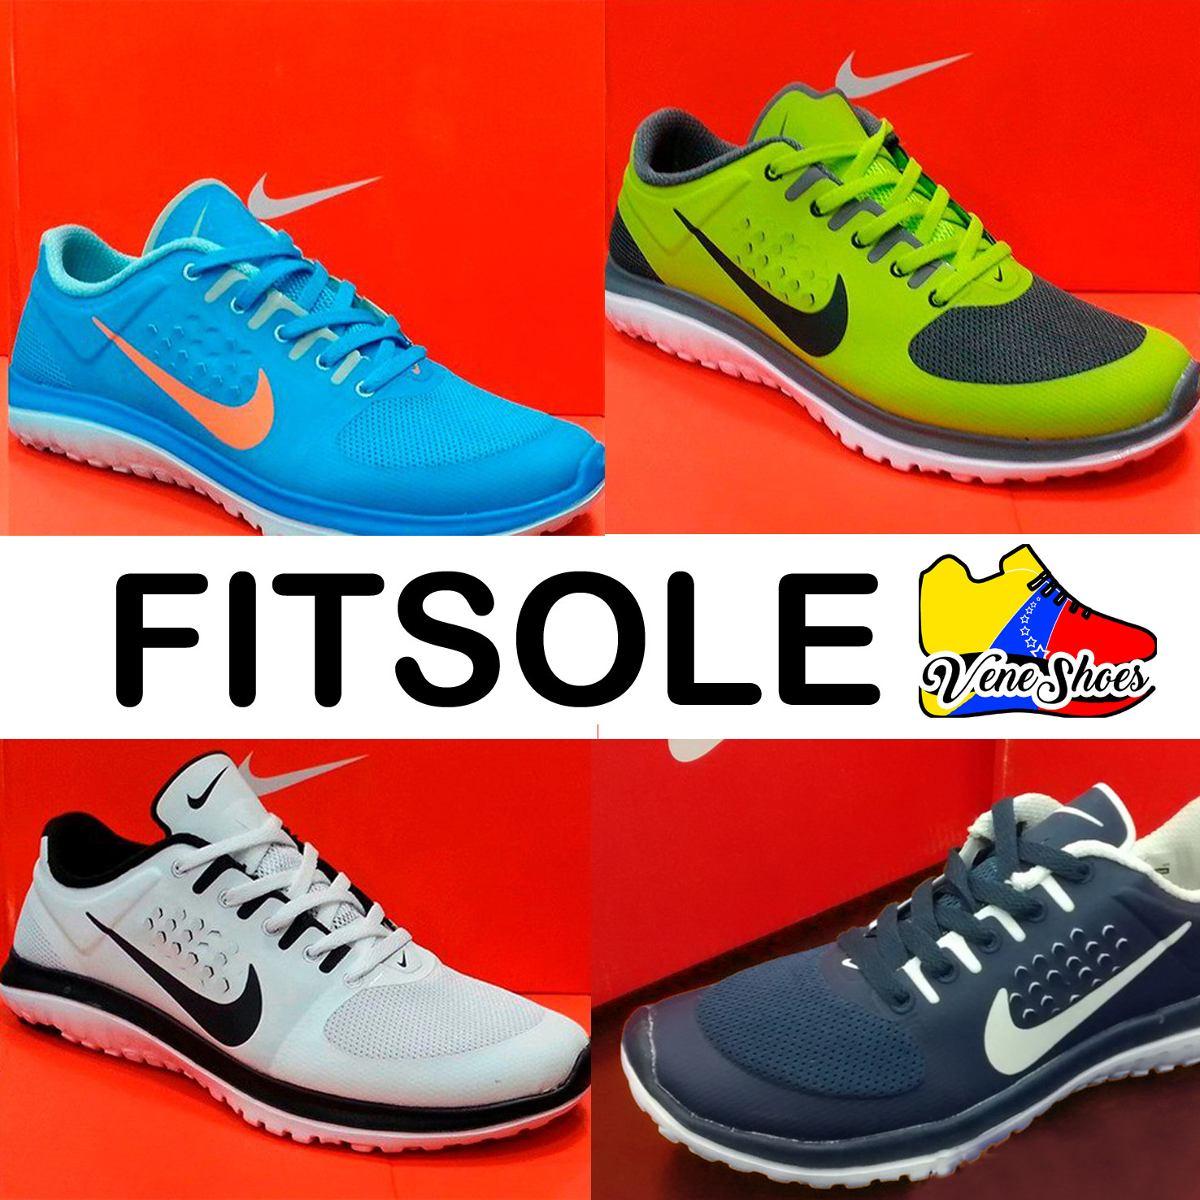 Liquidacion Zapatos Nike Damas Y Caballeros Fitsole ONn8v0wm